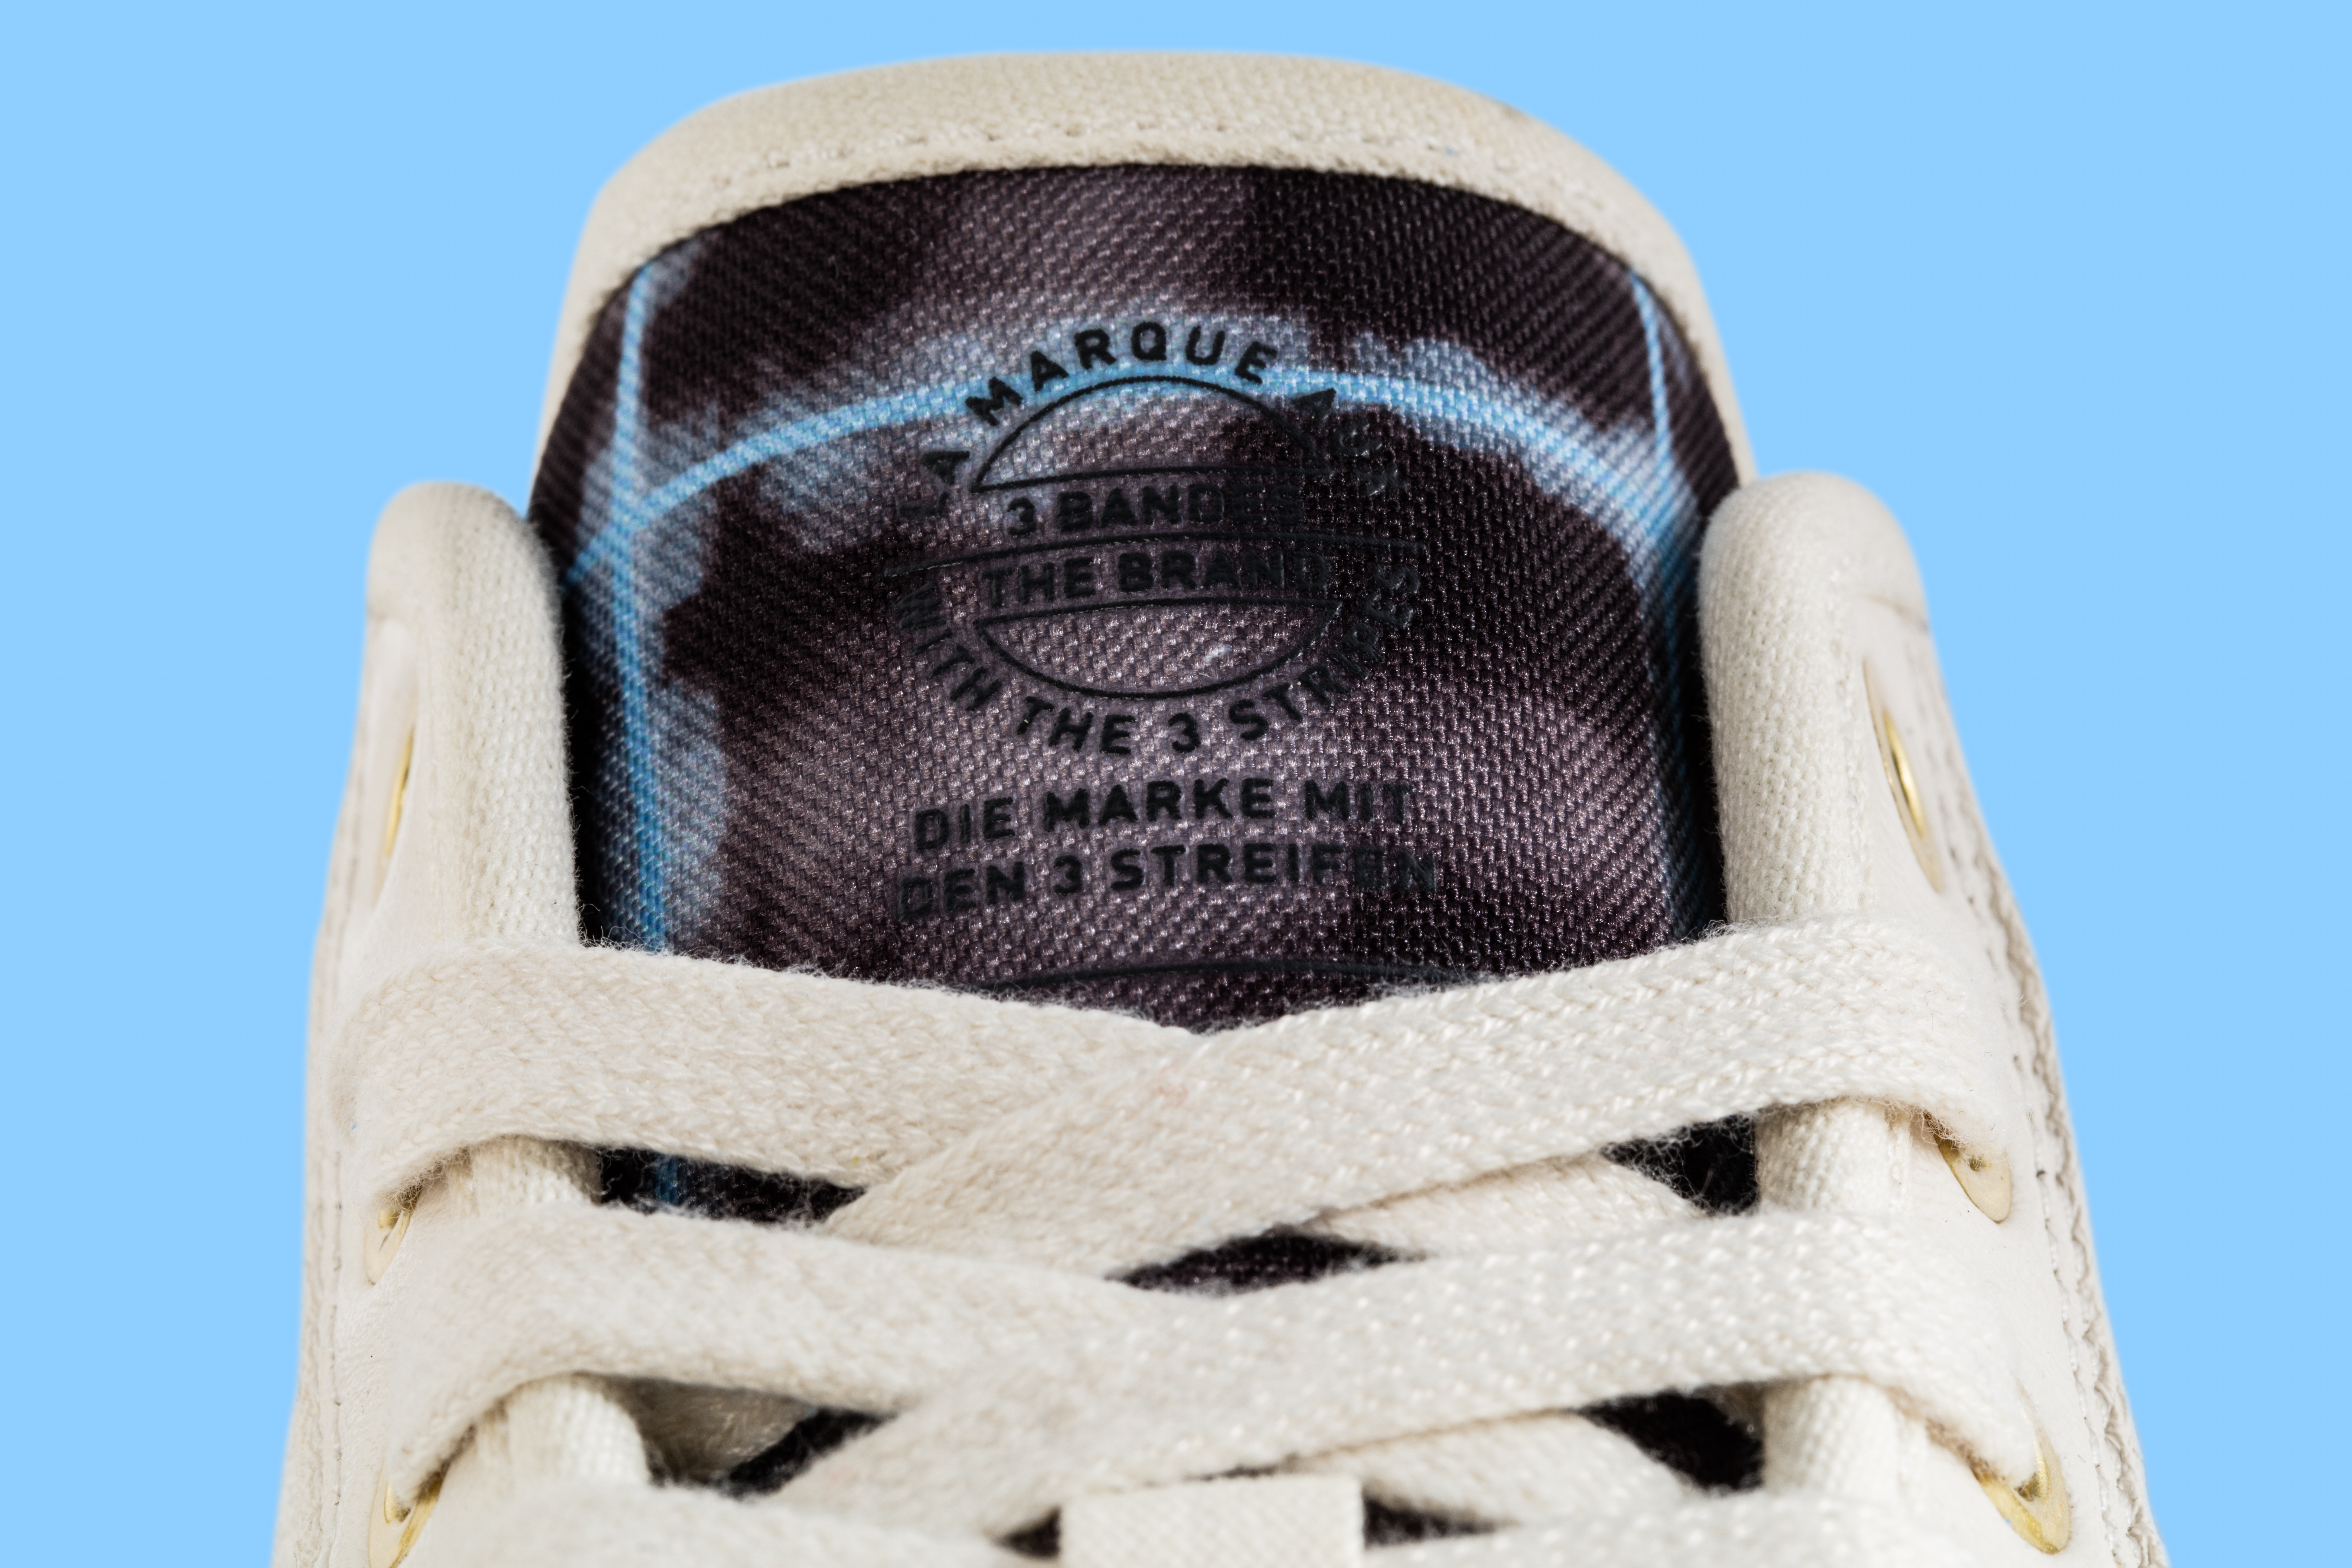 Snoop Dogg x Mark Gonzales x adidas Matchcourt Mid